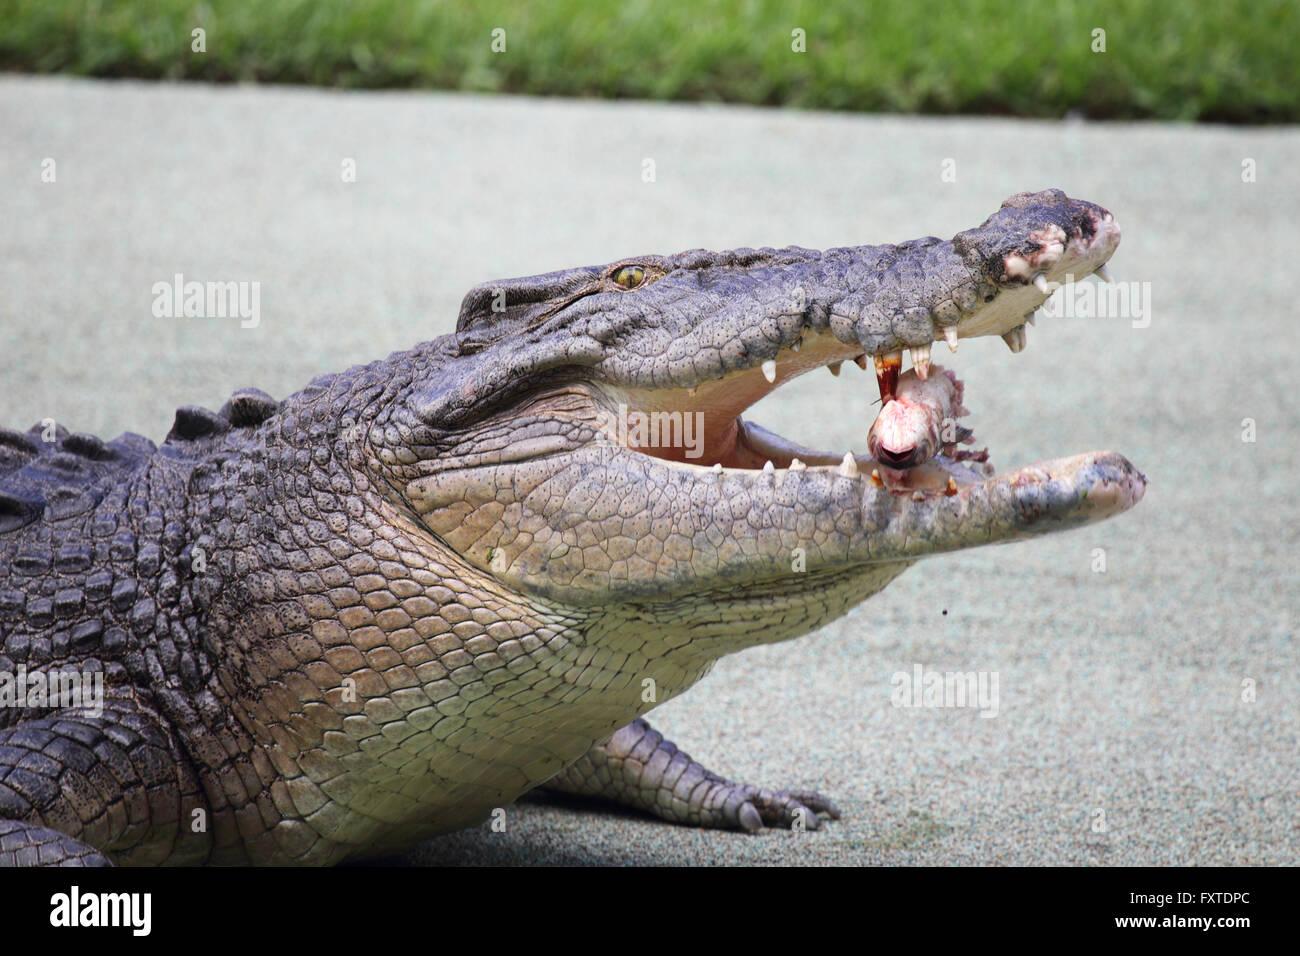 Saltwater Crocodile (Crocodylus porosus) in Queensland, Australia. - Stock Image